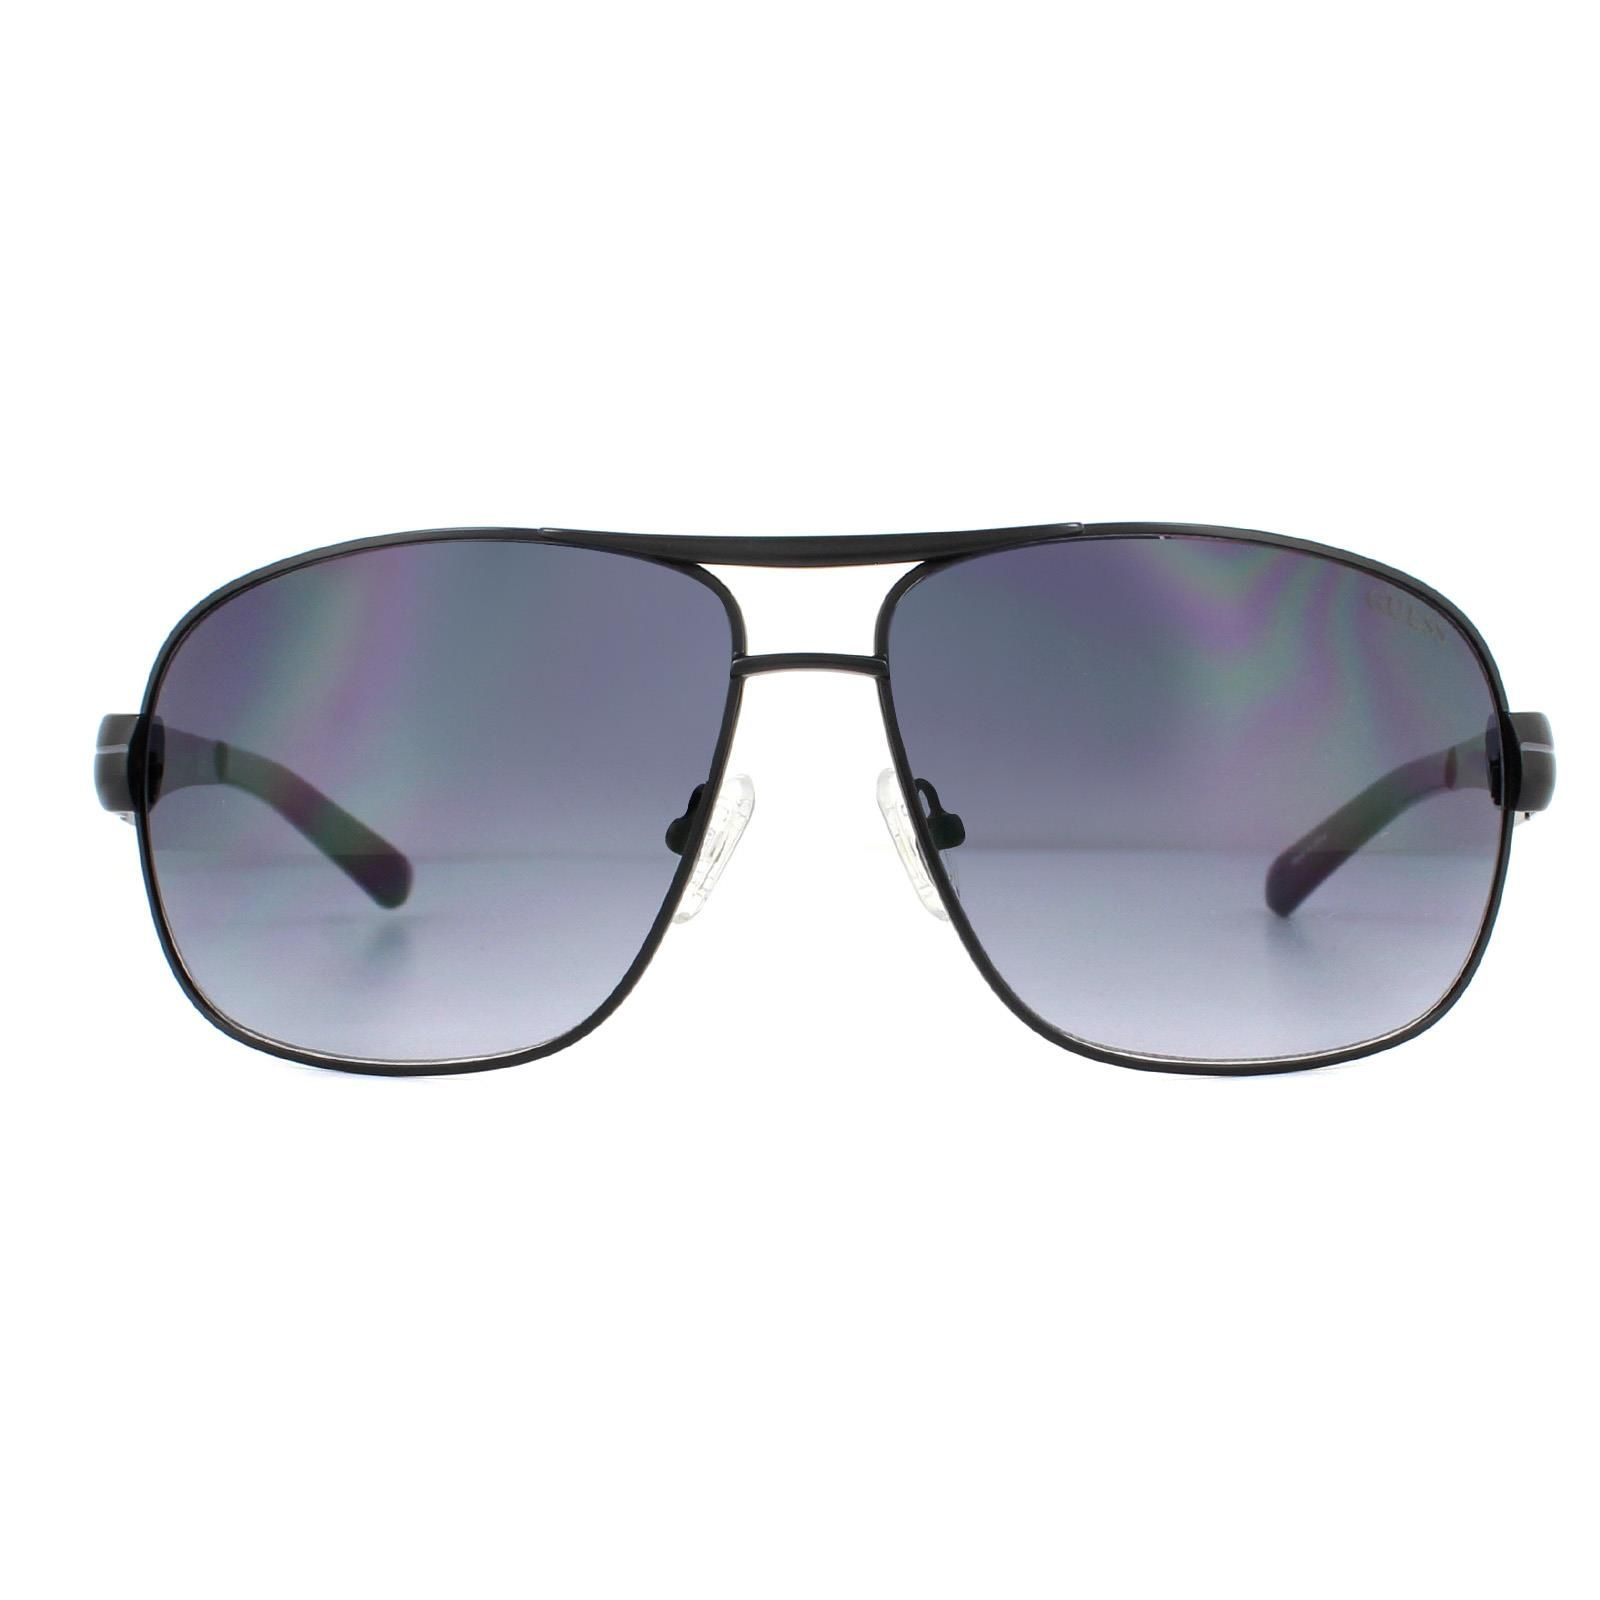 Guess Sunglasses GF5021 02B Black Grey Gradient